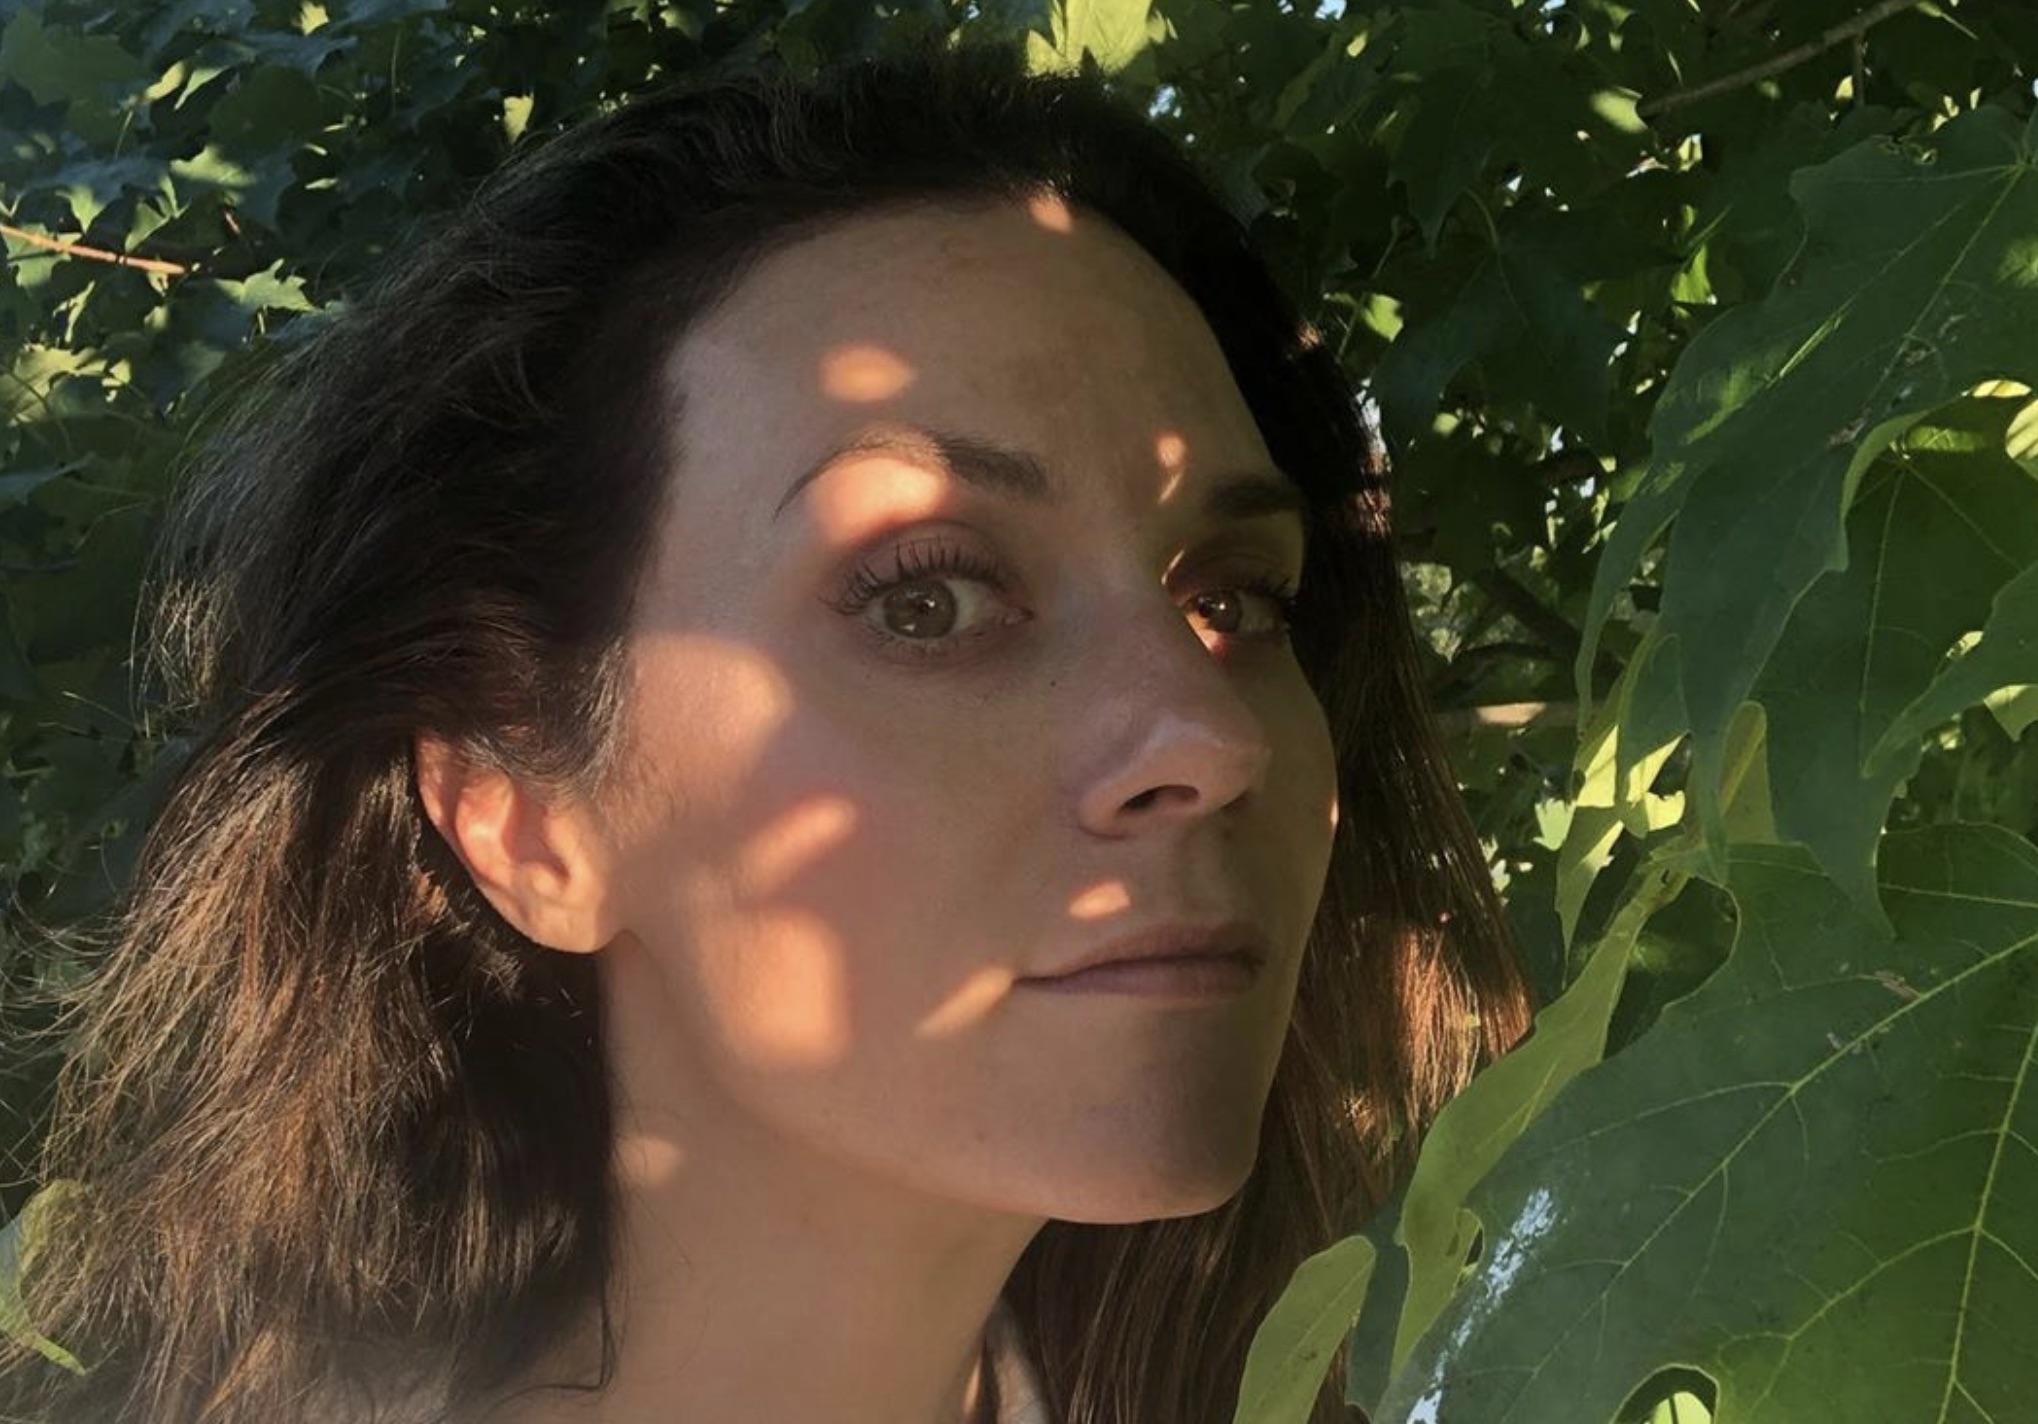 Hilarie Burton, Hallmark-https://www.instagram.com/p/B19ylftlsuV/